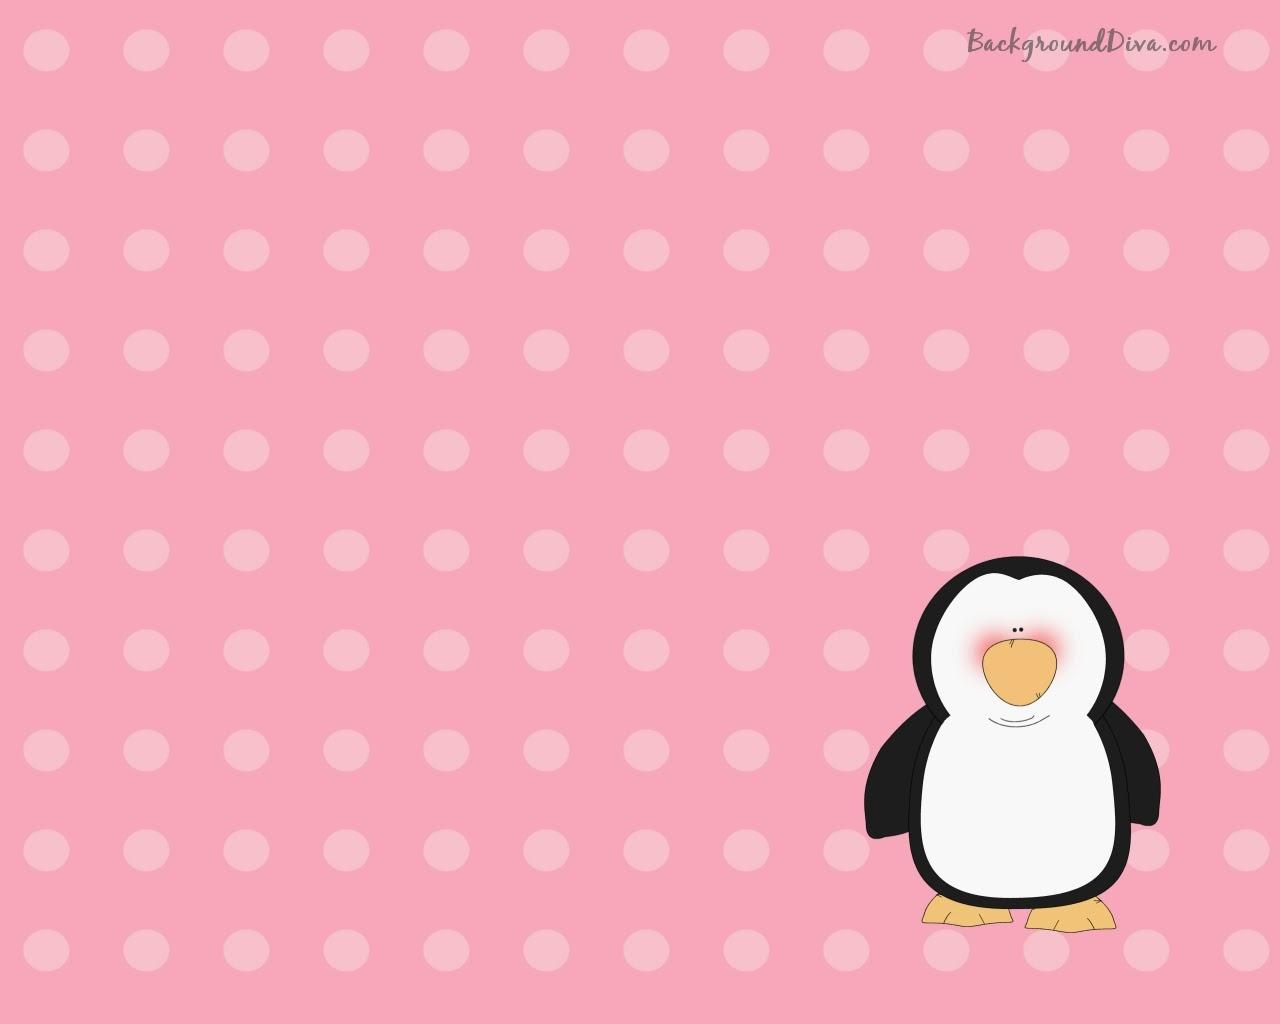 Cute Wallpapers for Desktop 3D Cute Wallpapers for Desktop Cute 1280x1024